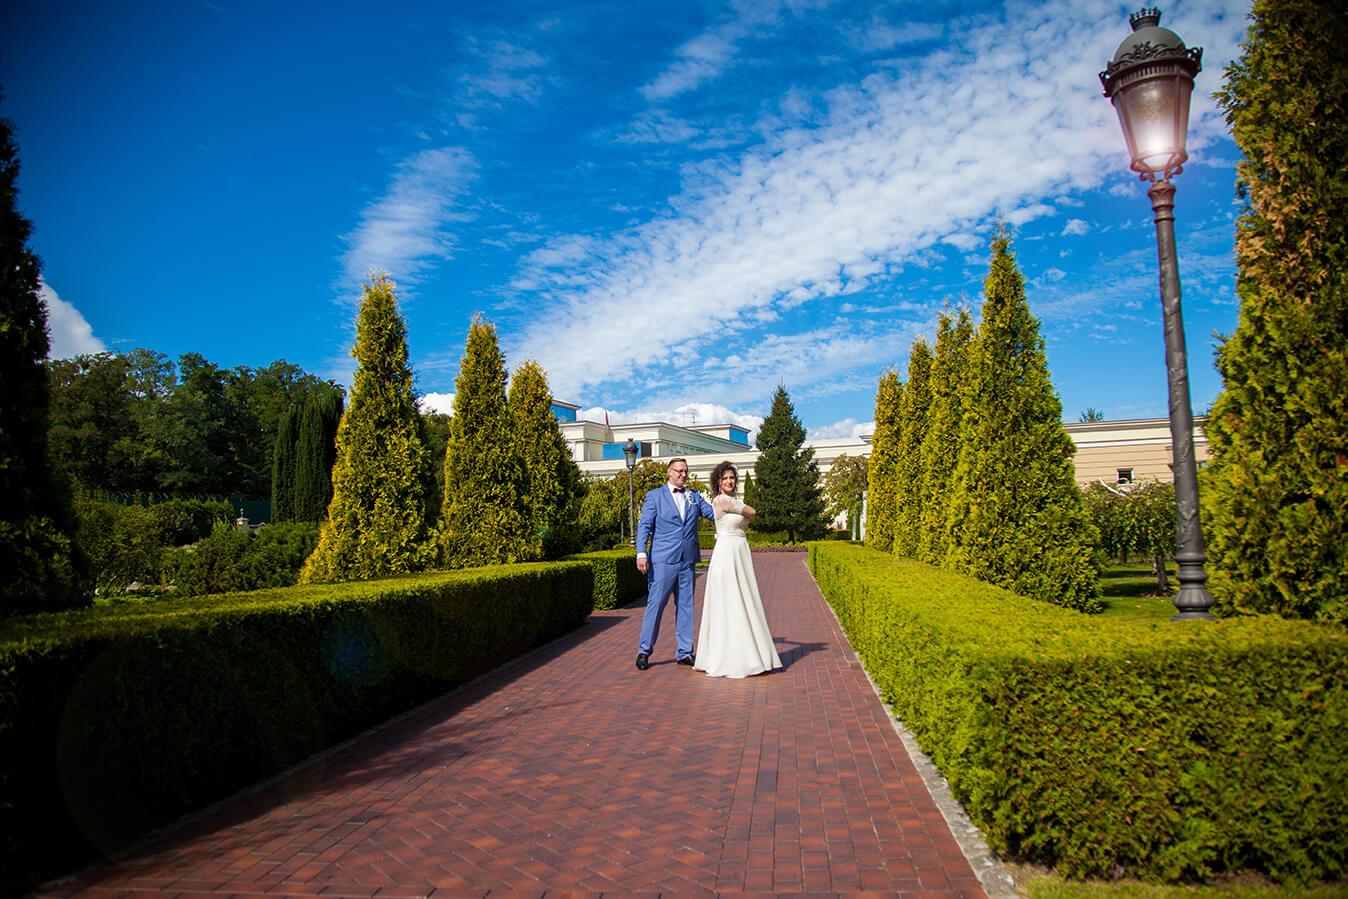 3-svadebnyj-fotograf-videooperator-svadebnoe-foto-idei-kiev-12